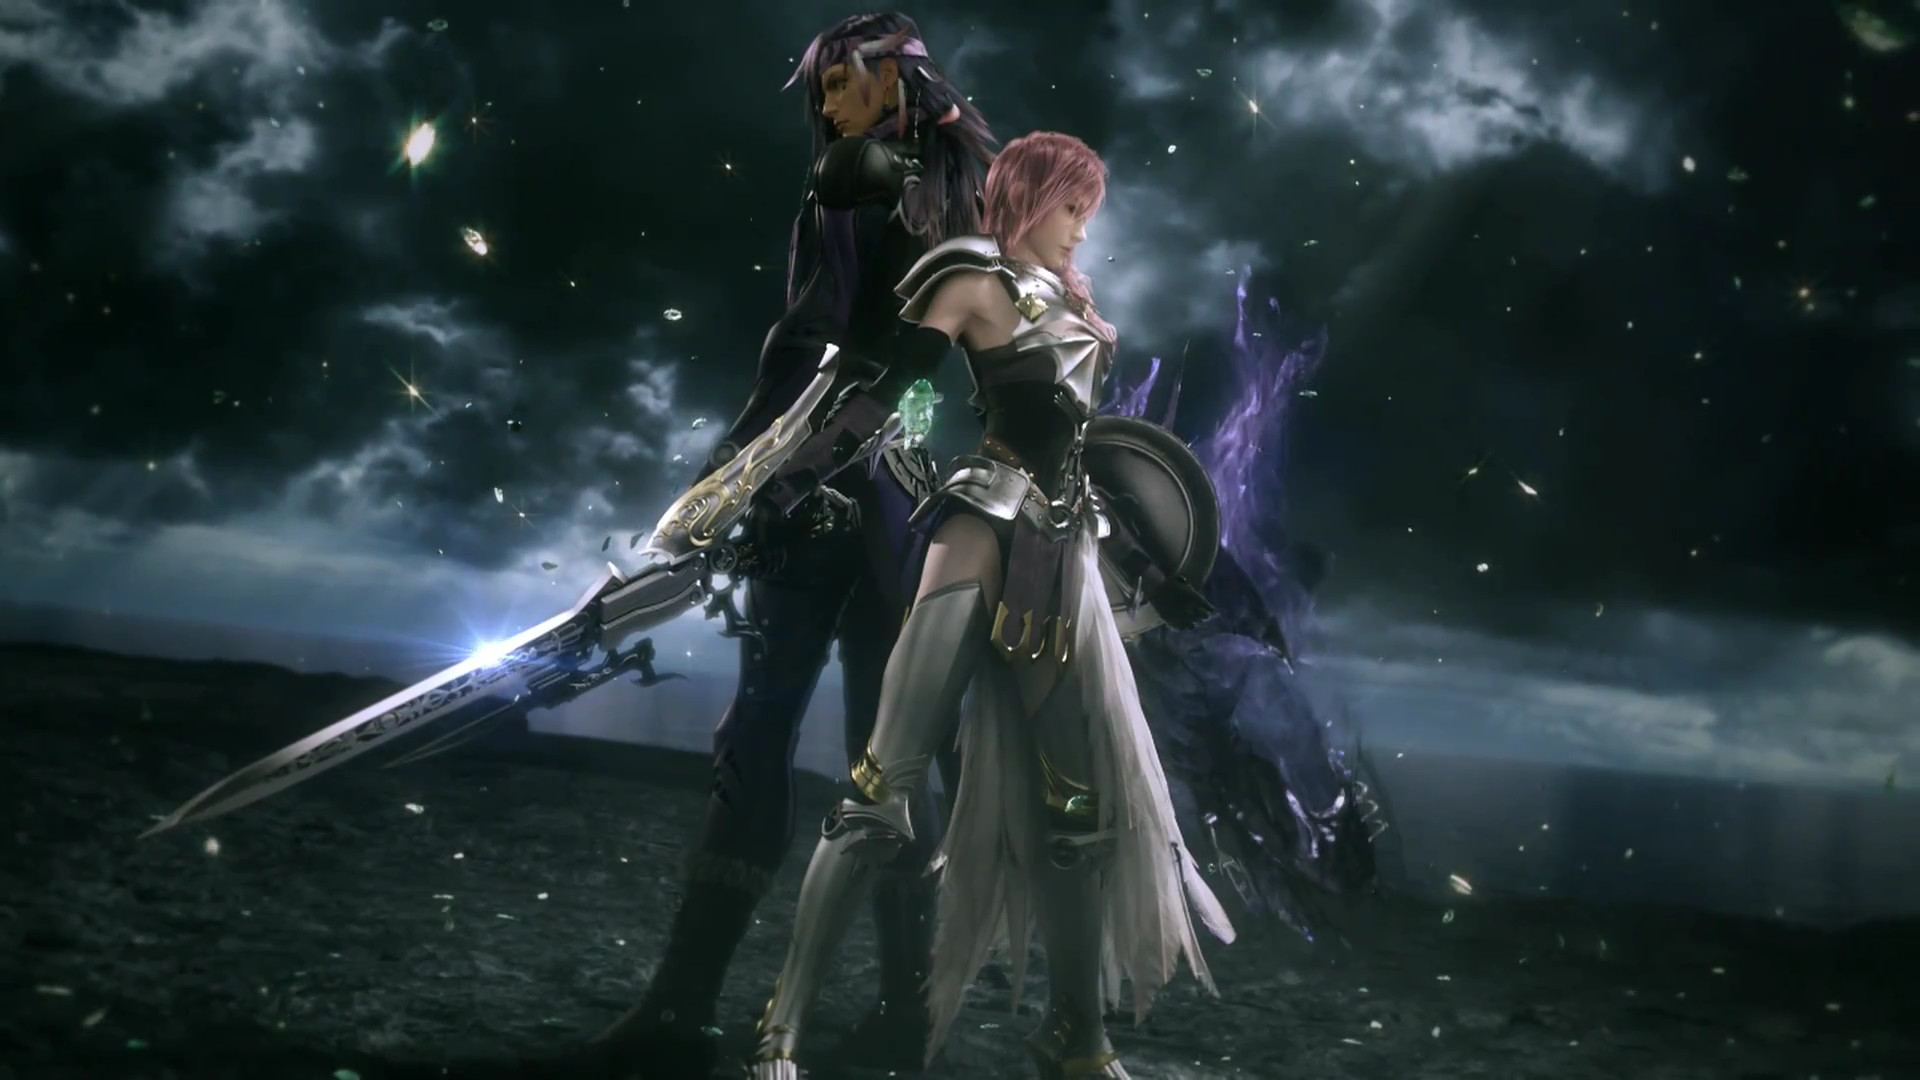 Final Fantasy Game HD Wallpaper 16407